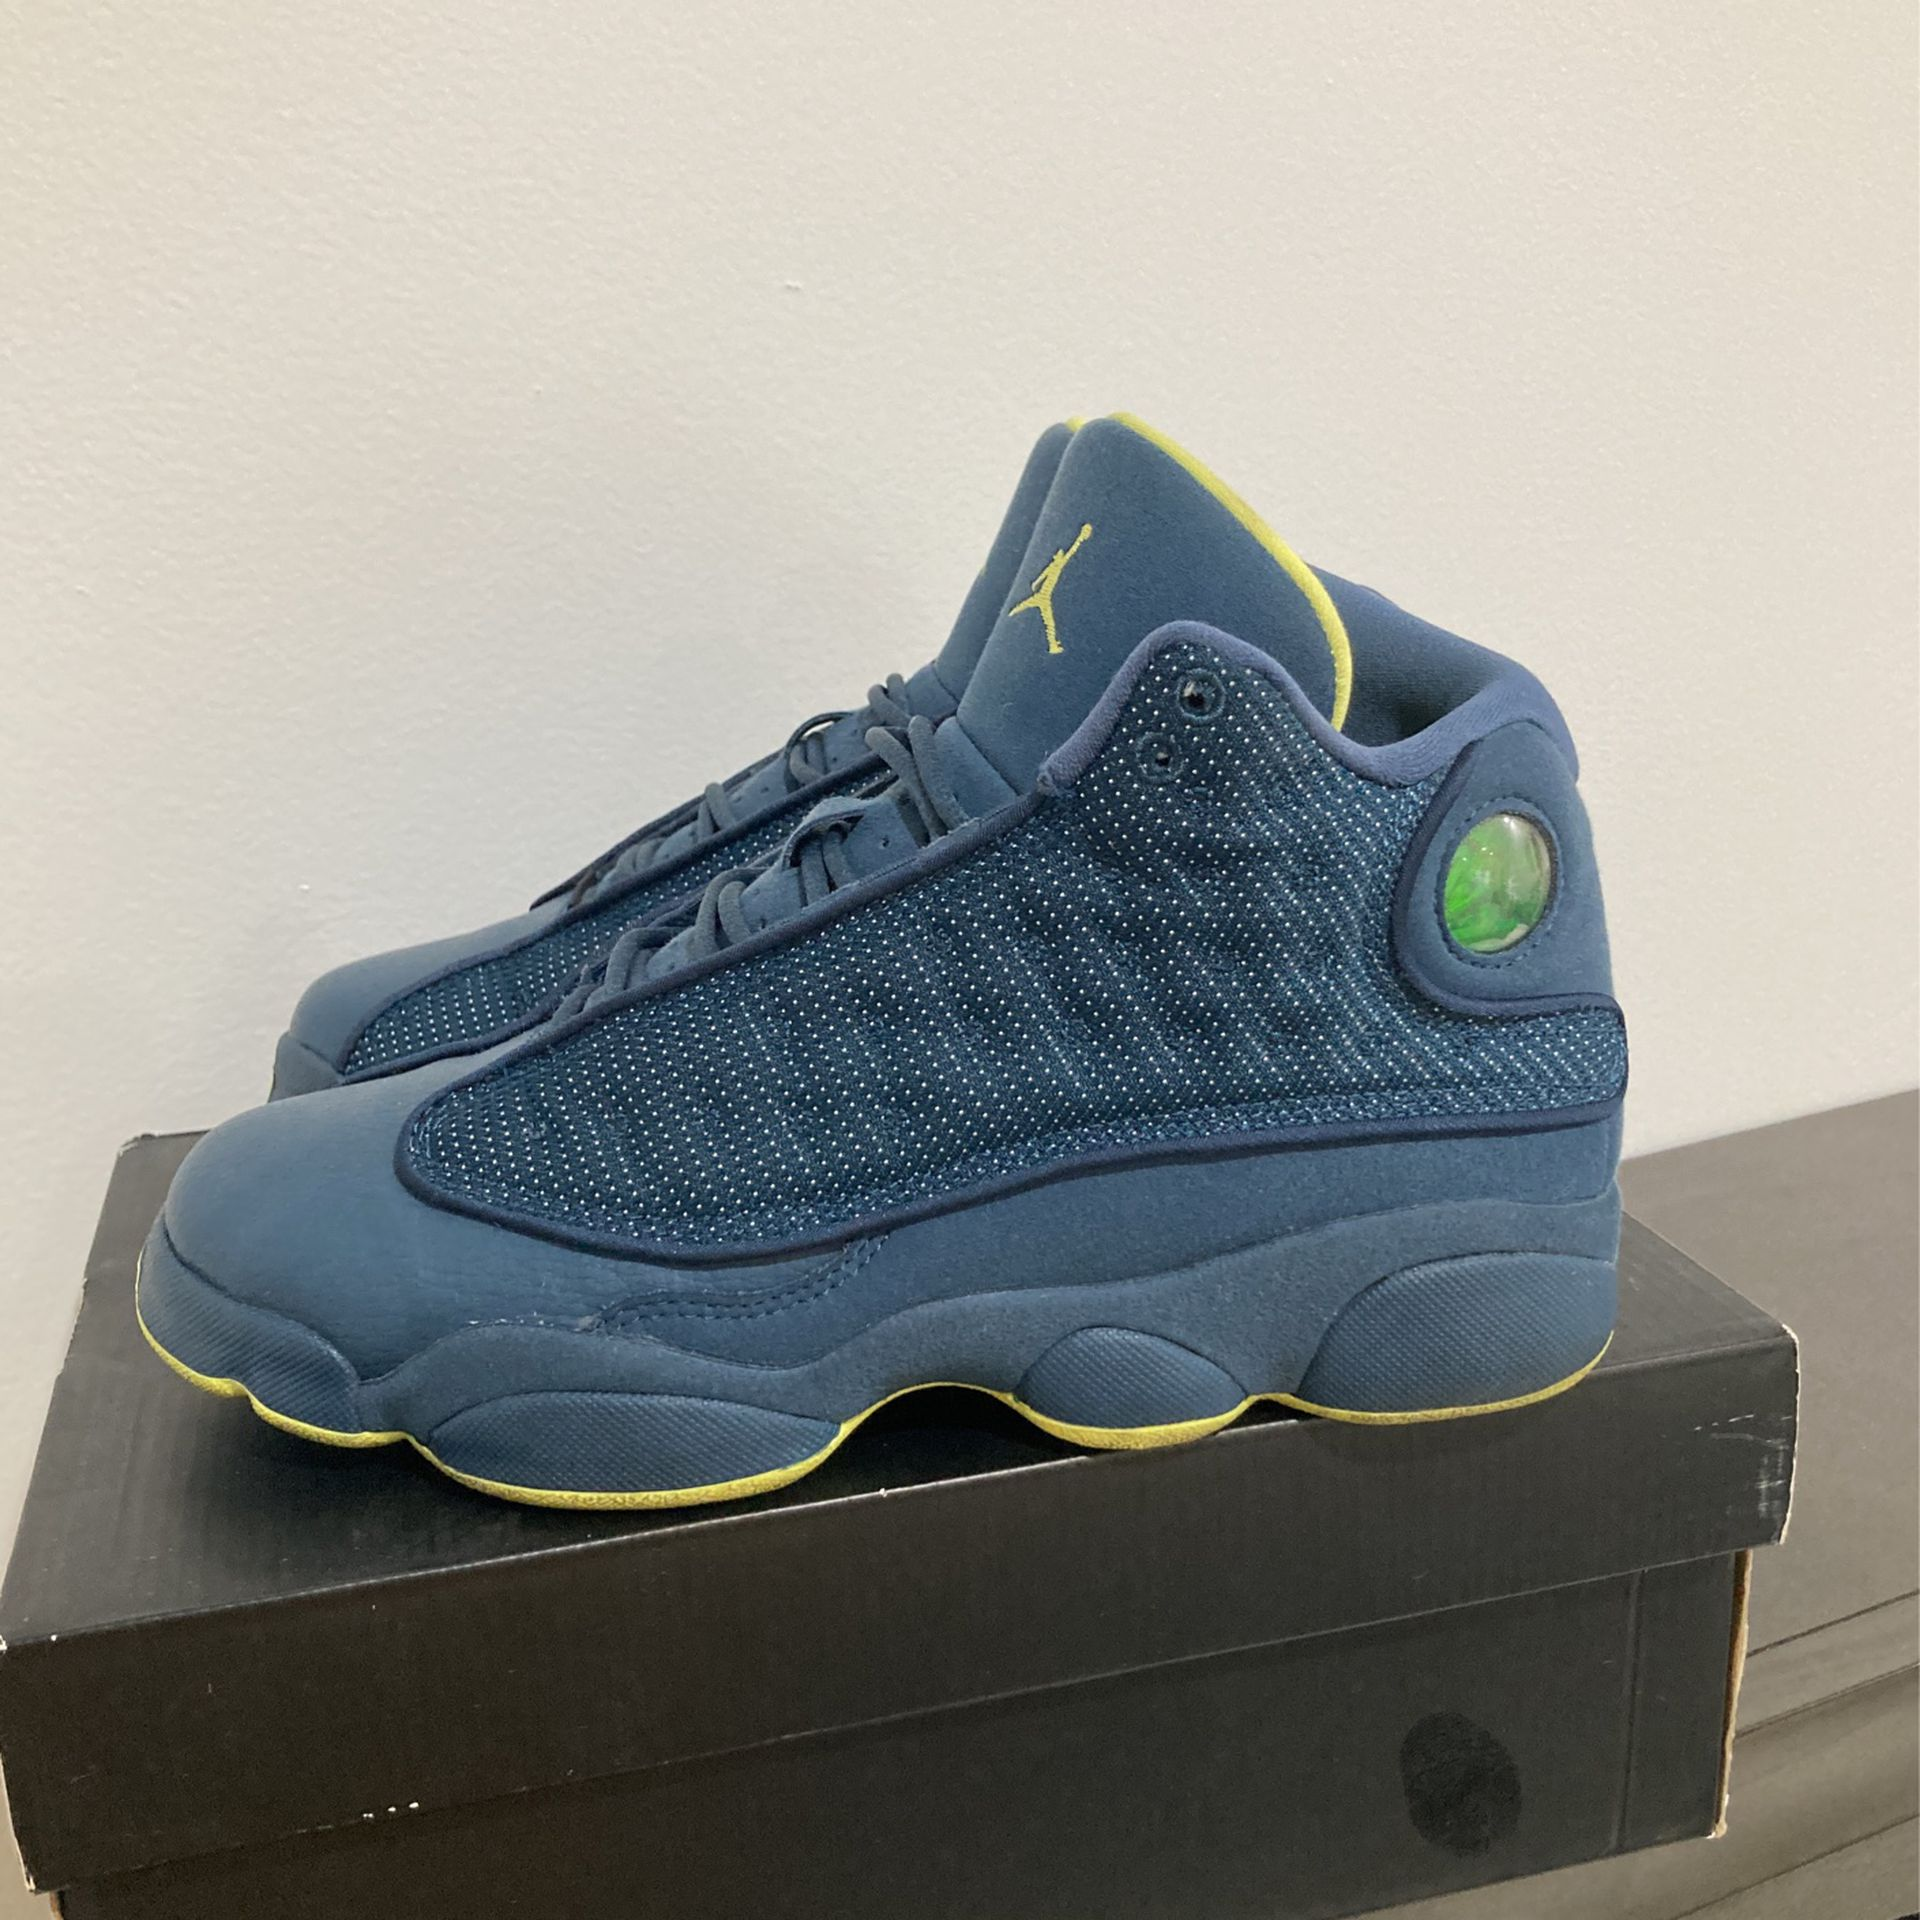 Jordan 13 Retro Squadron Blue